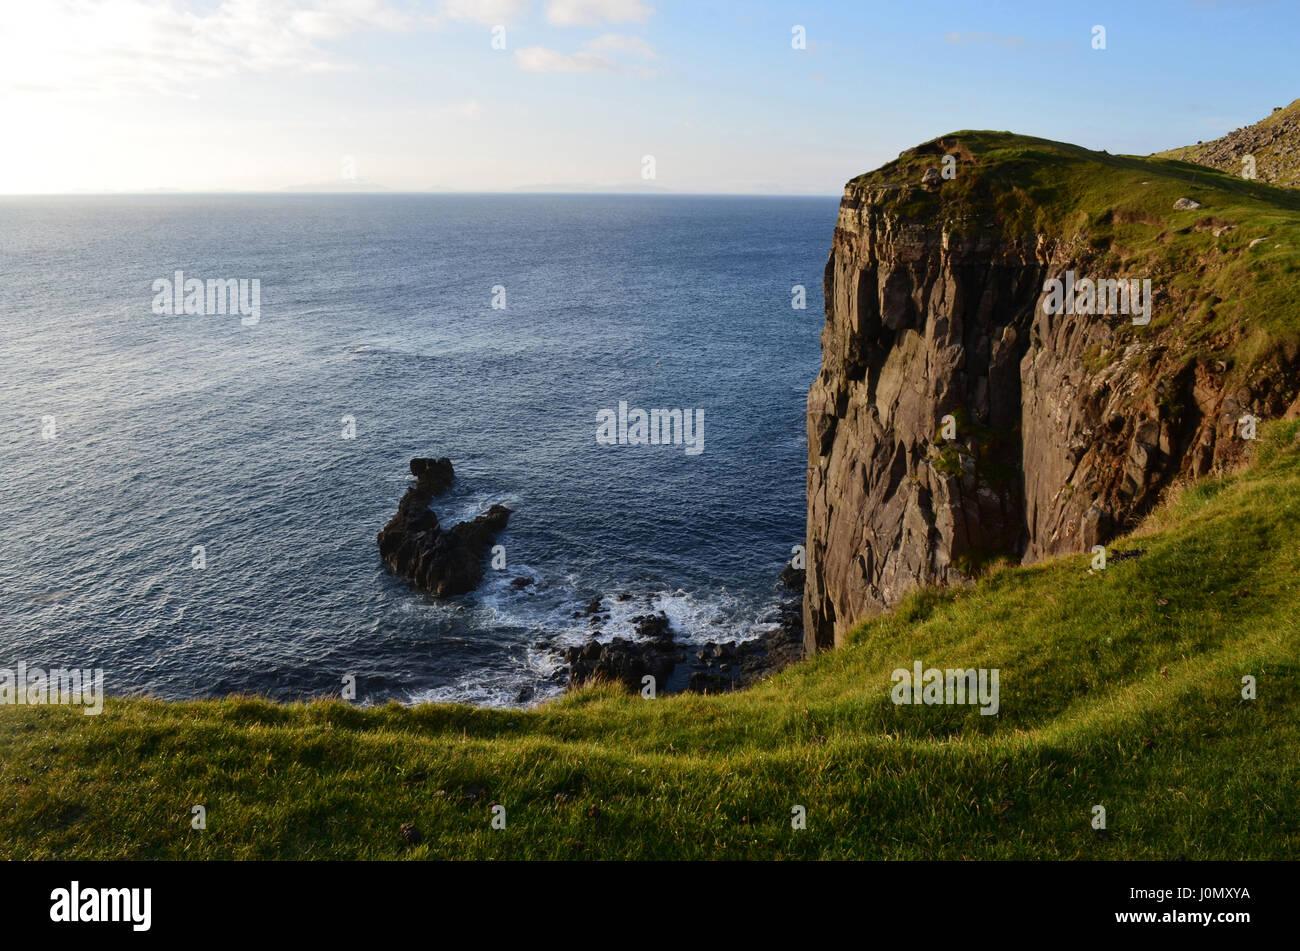 Skye's Neist Point has amazing tall sea cliffs. - Stock Image